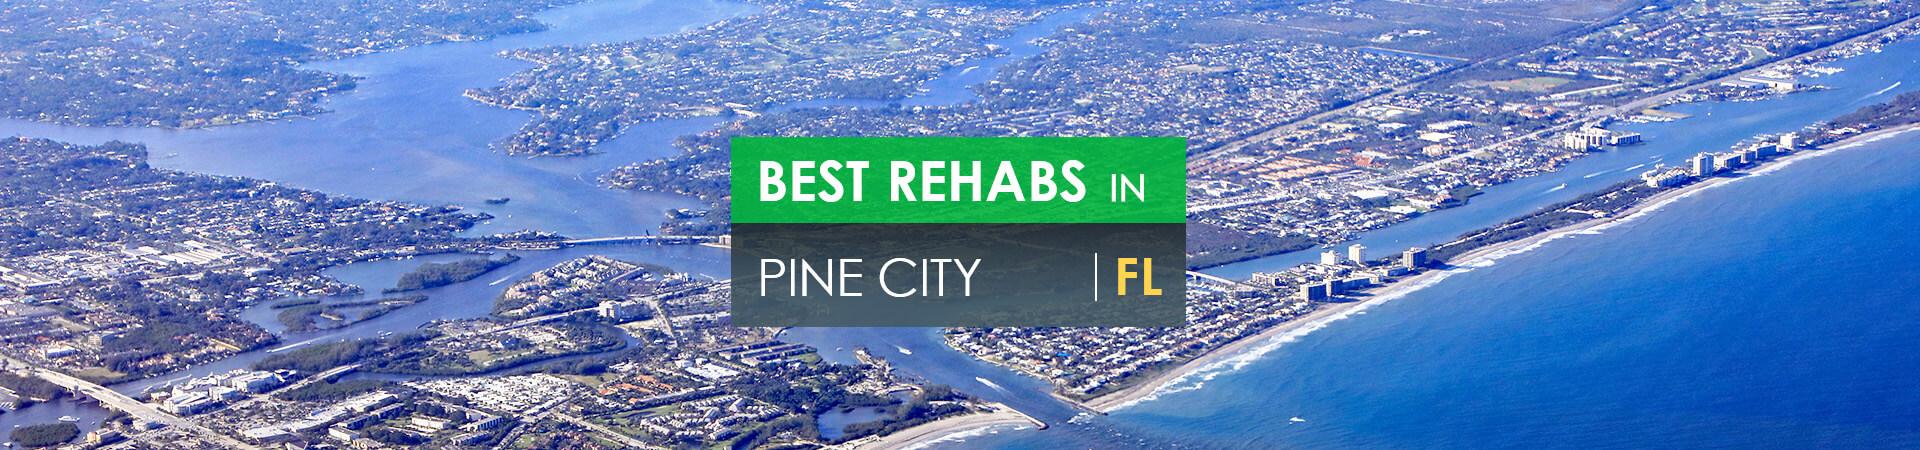 Best rehabs in Tequesta, FL